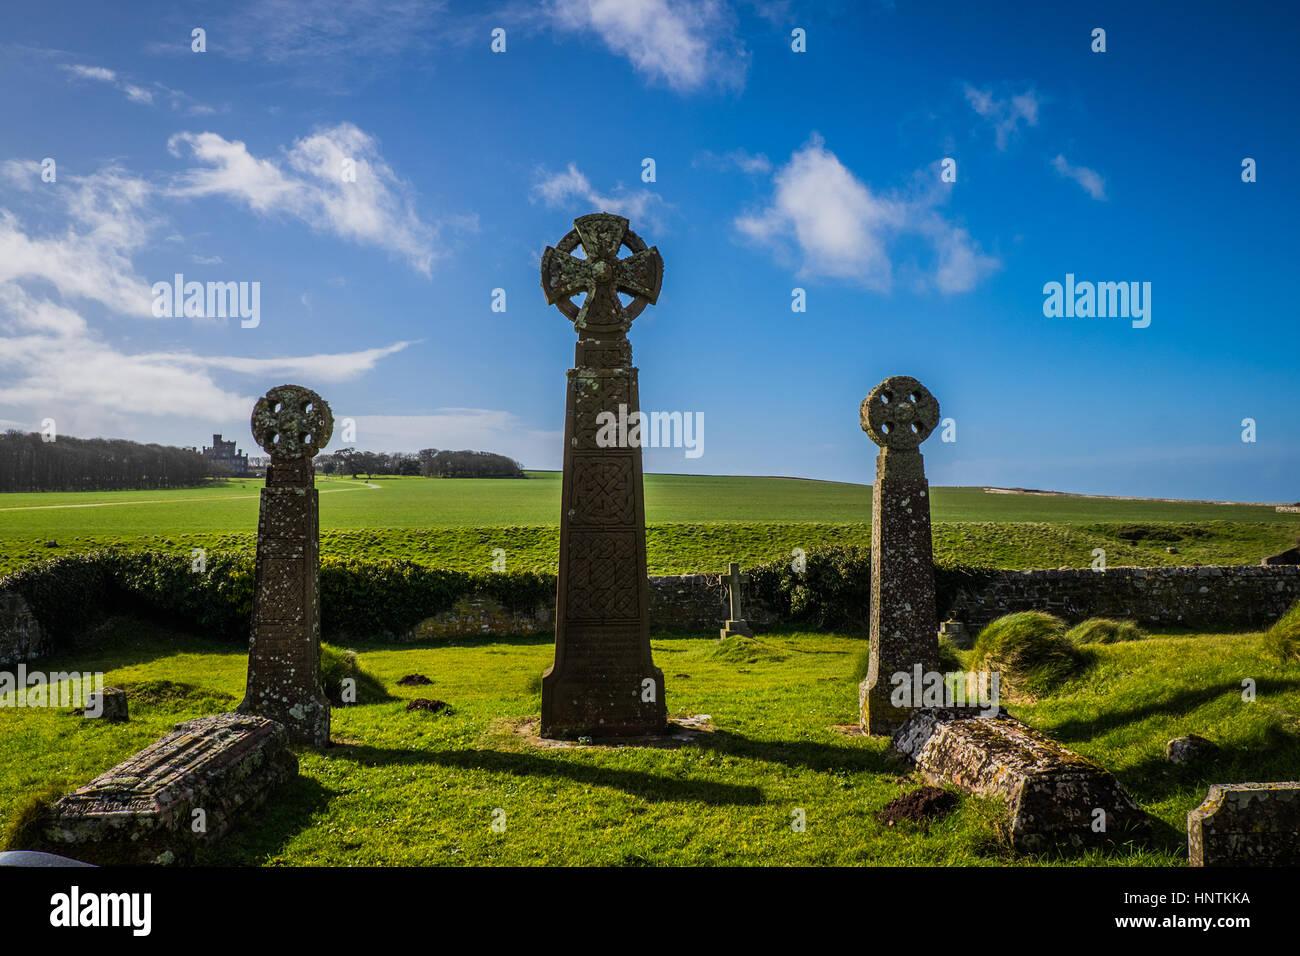 Crosses in graveyard - Stock Image